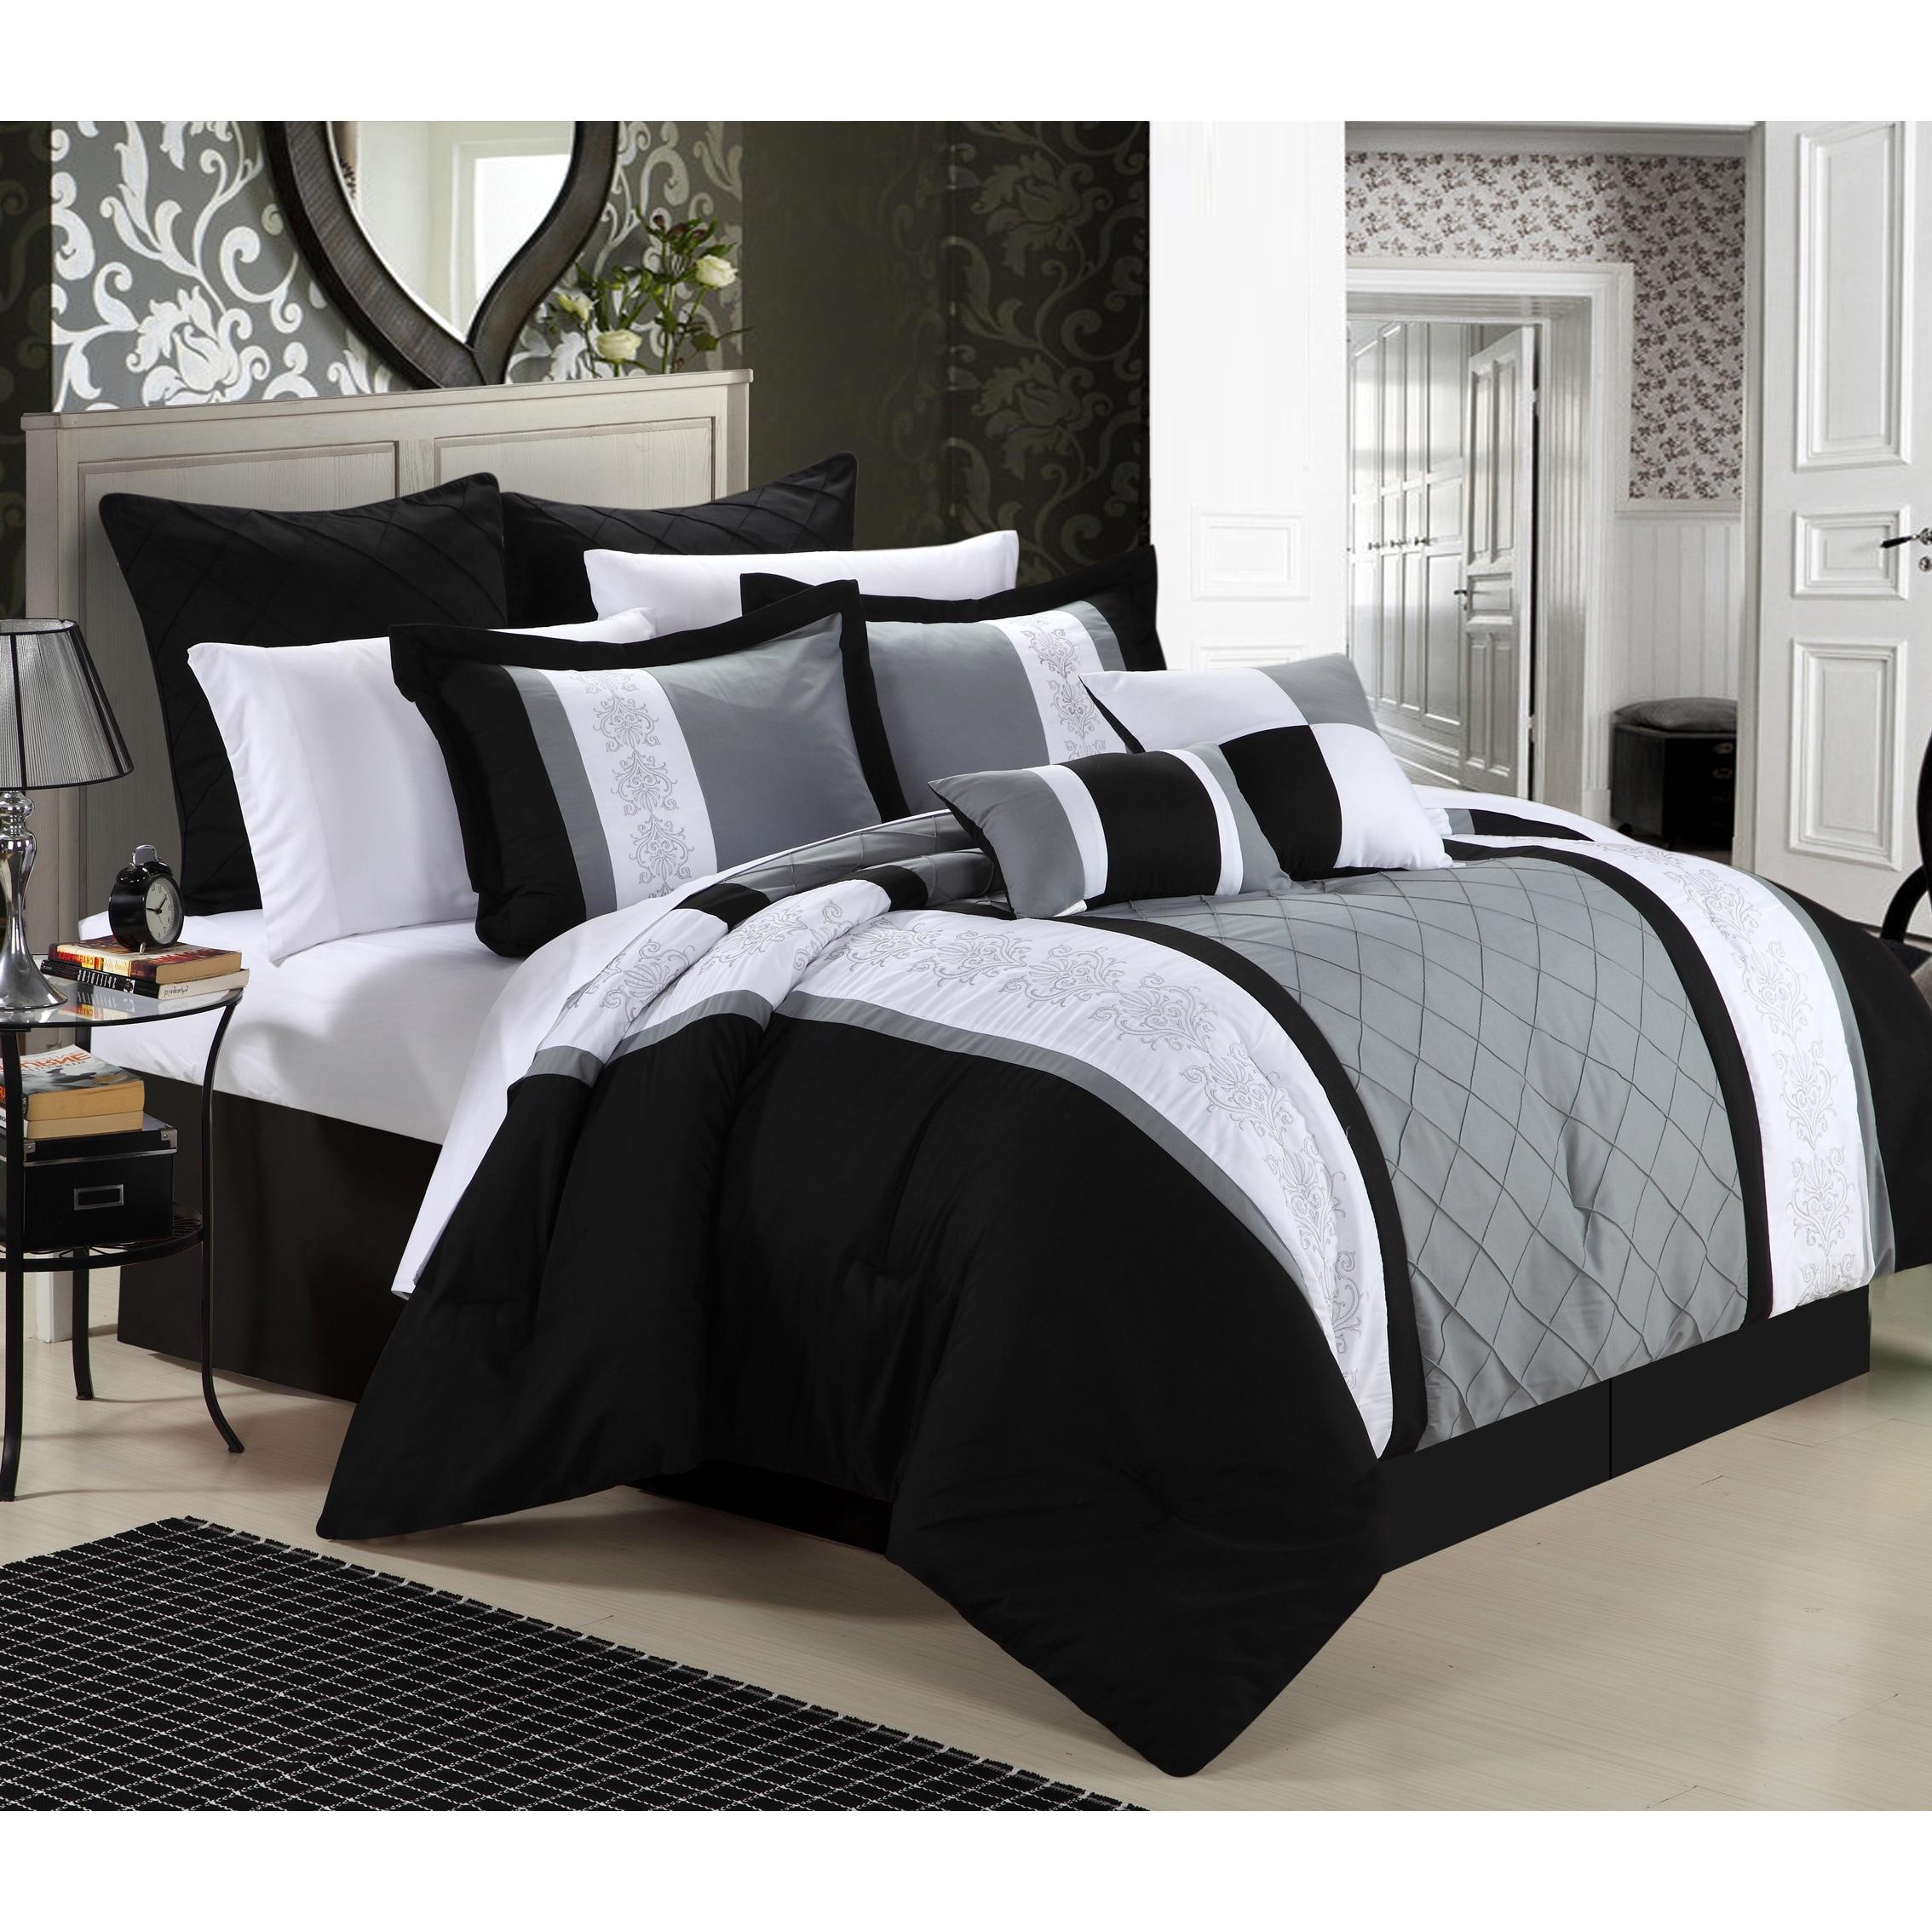 Livingston 8 Piece Comforter Set On Sale Overstock 7582915